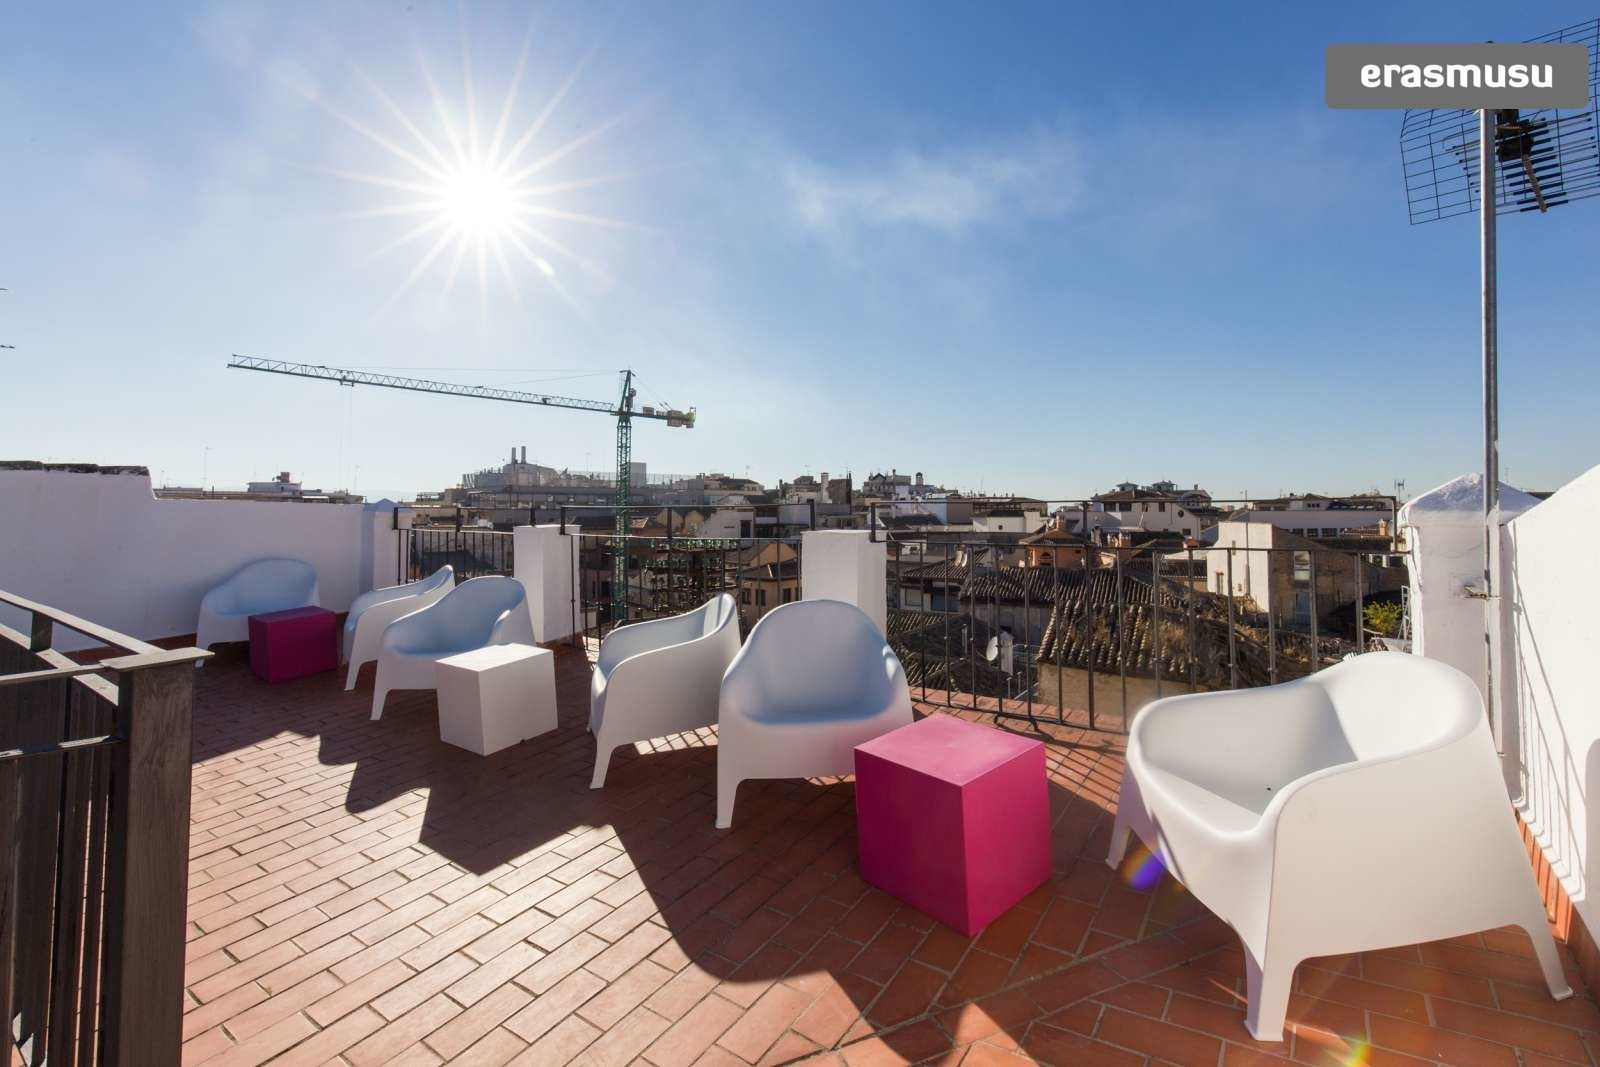 charming-studio-apartment-rent-city-centre-63aab4040544d115d7b0c